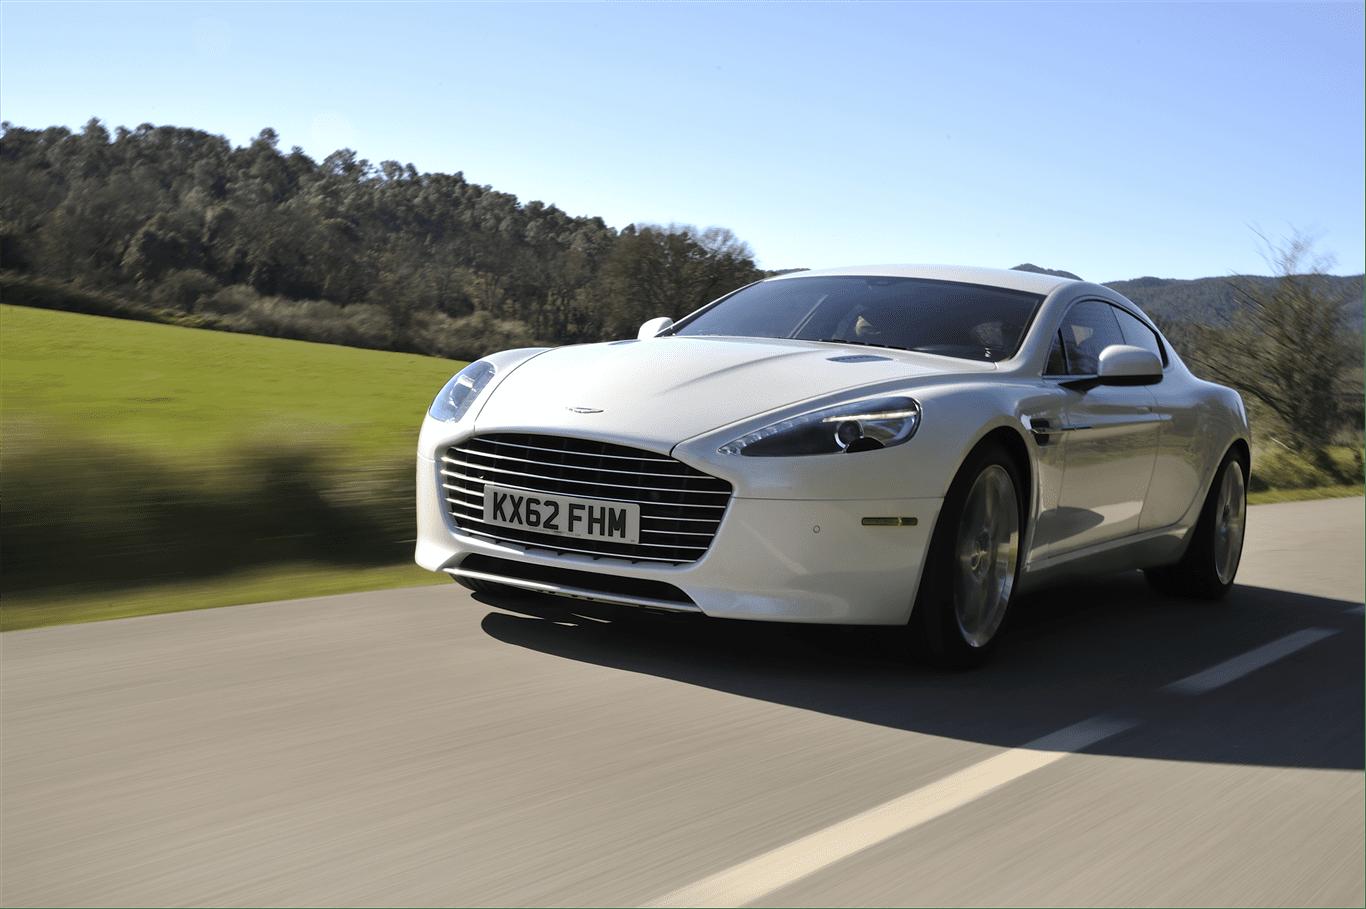 Aston Martin 要和樂視及法拉第未來合作,打造以 rapide S 跑車為原型的電動車。圖片來源:Aston Martin